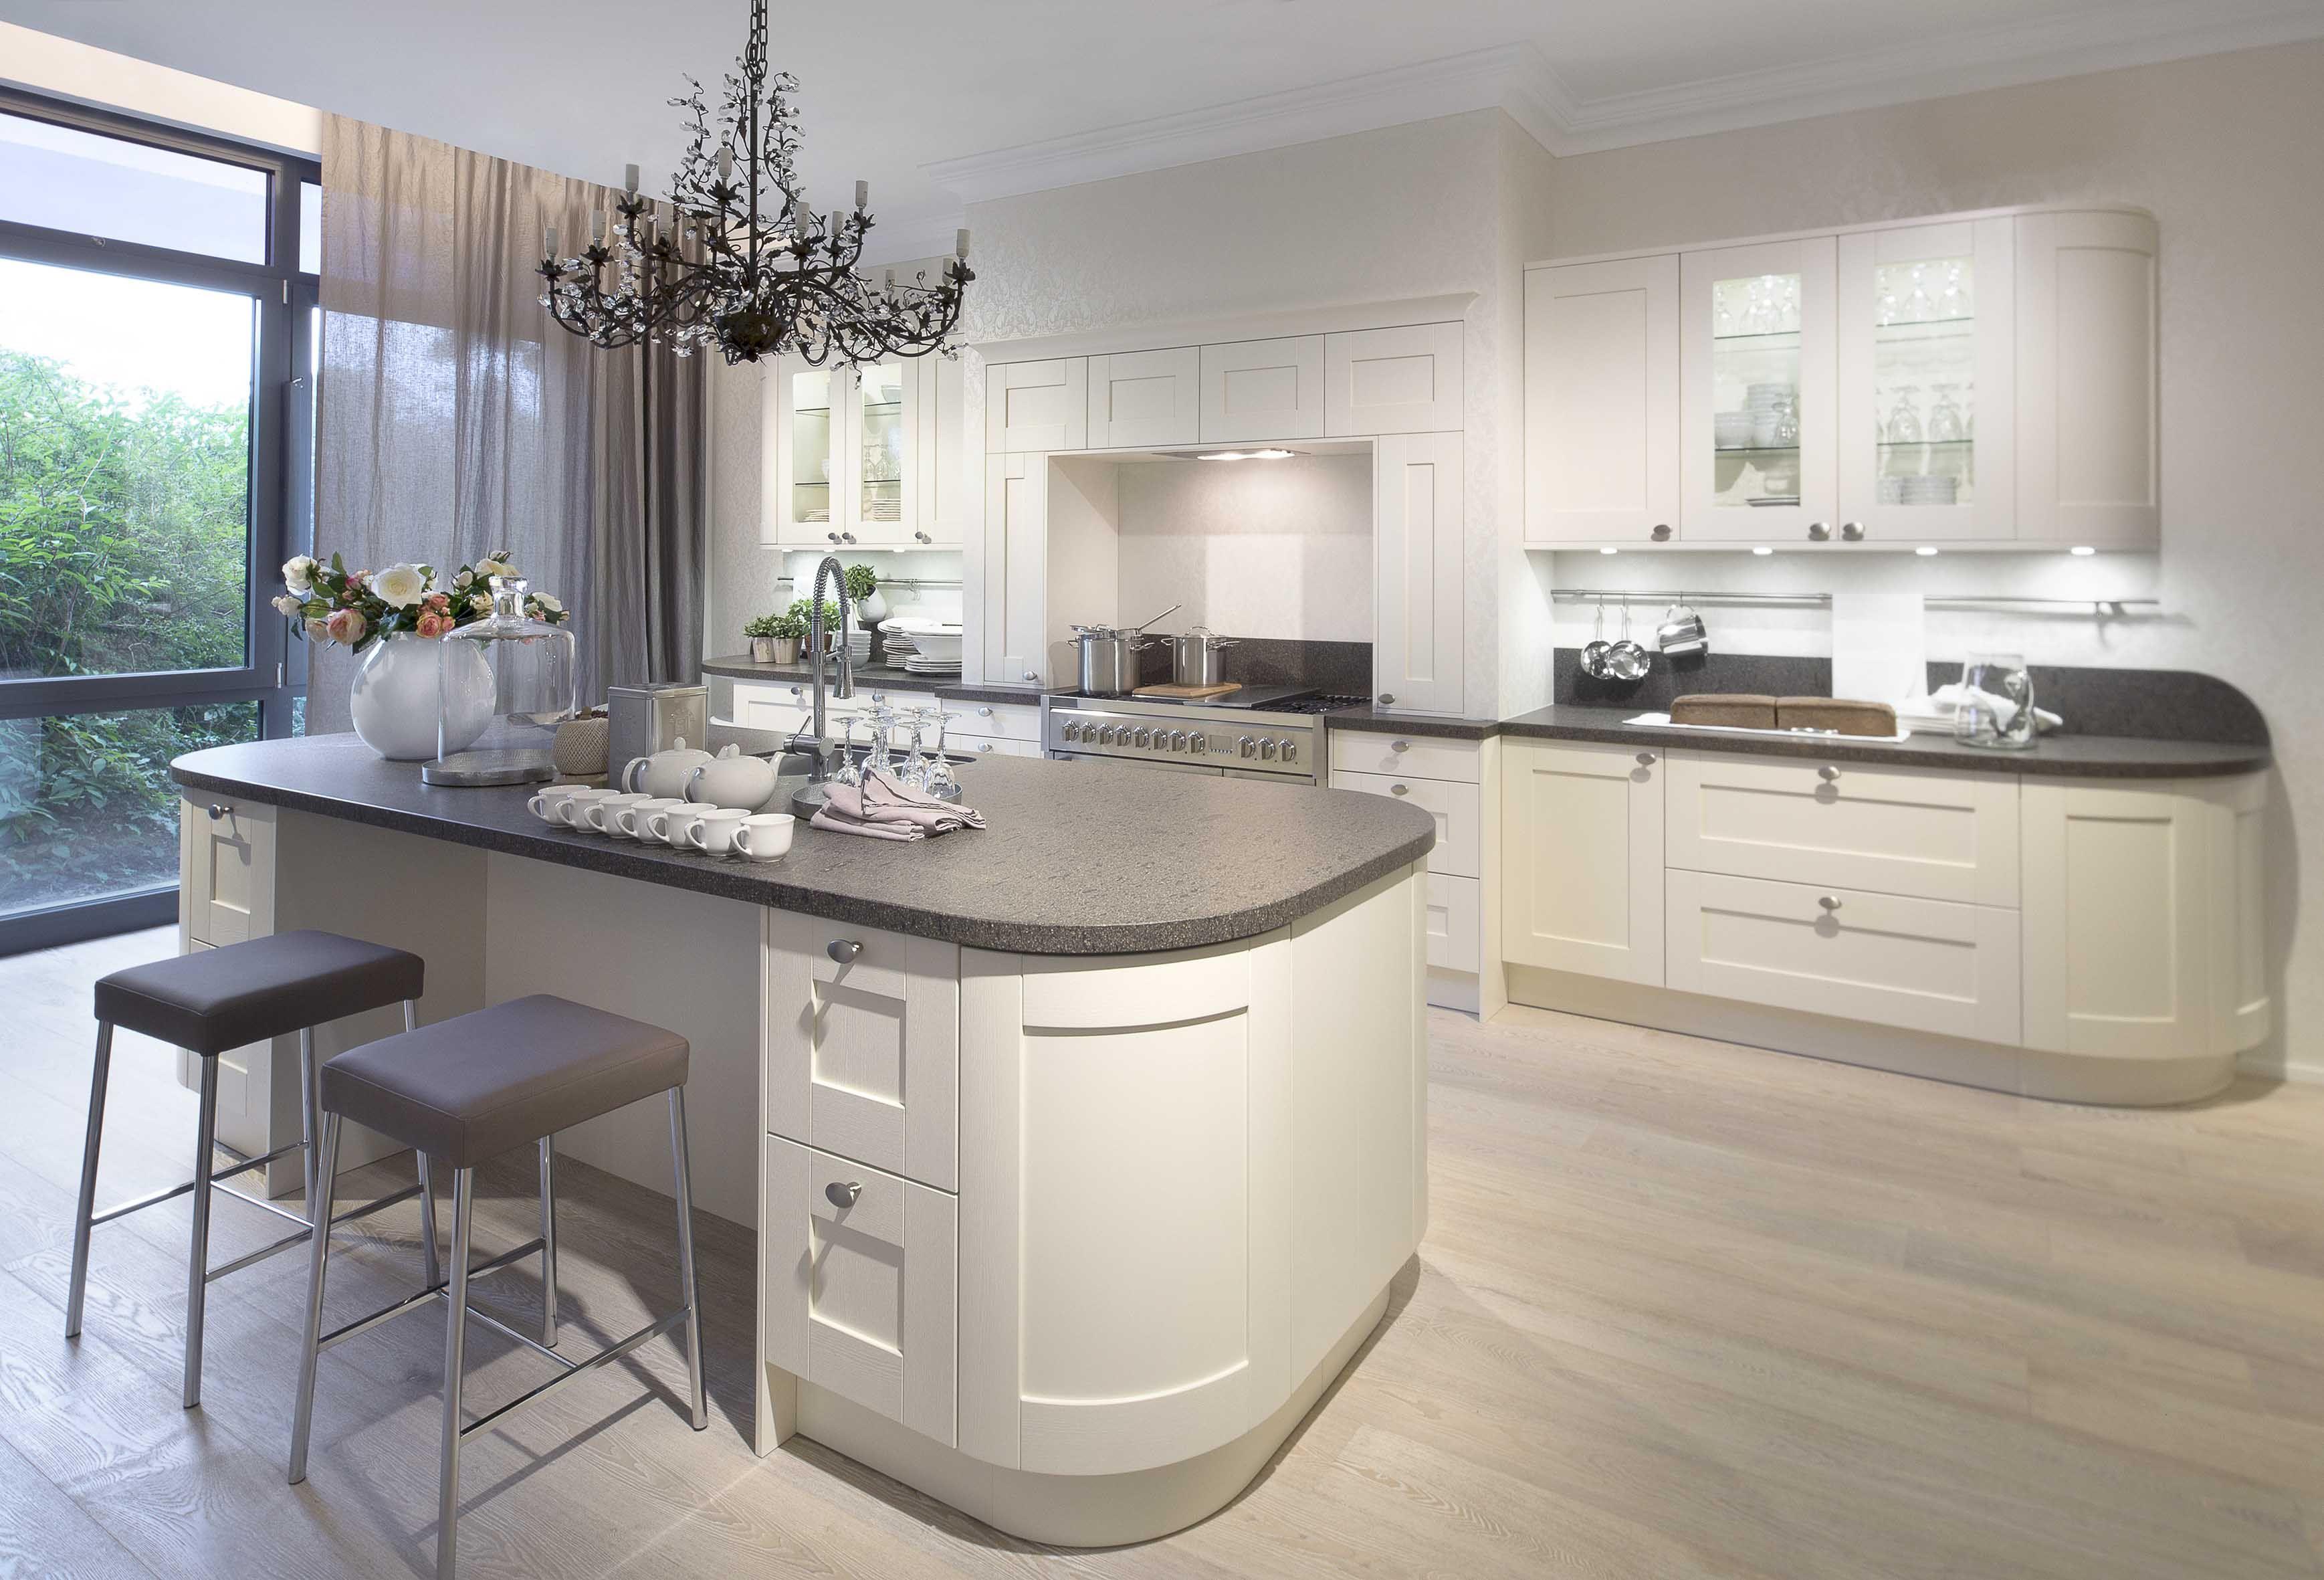 Cuisine, Kitchen, Keuken, Küchen, Cucina ! By Electros & Cuisines ...